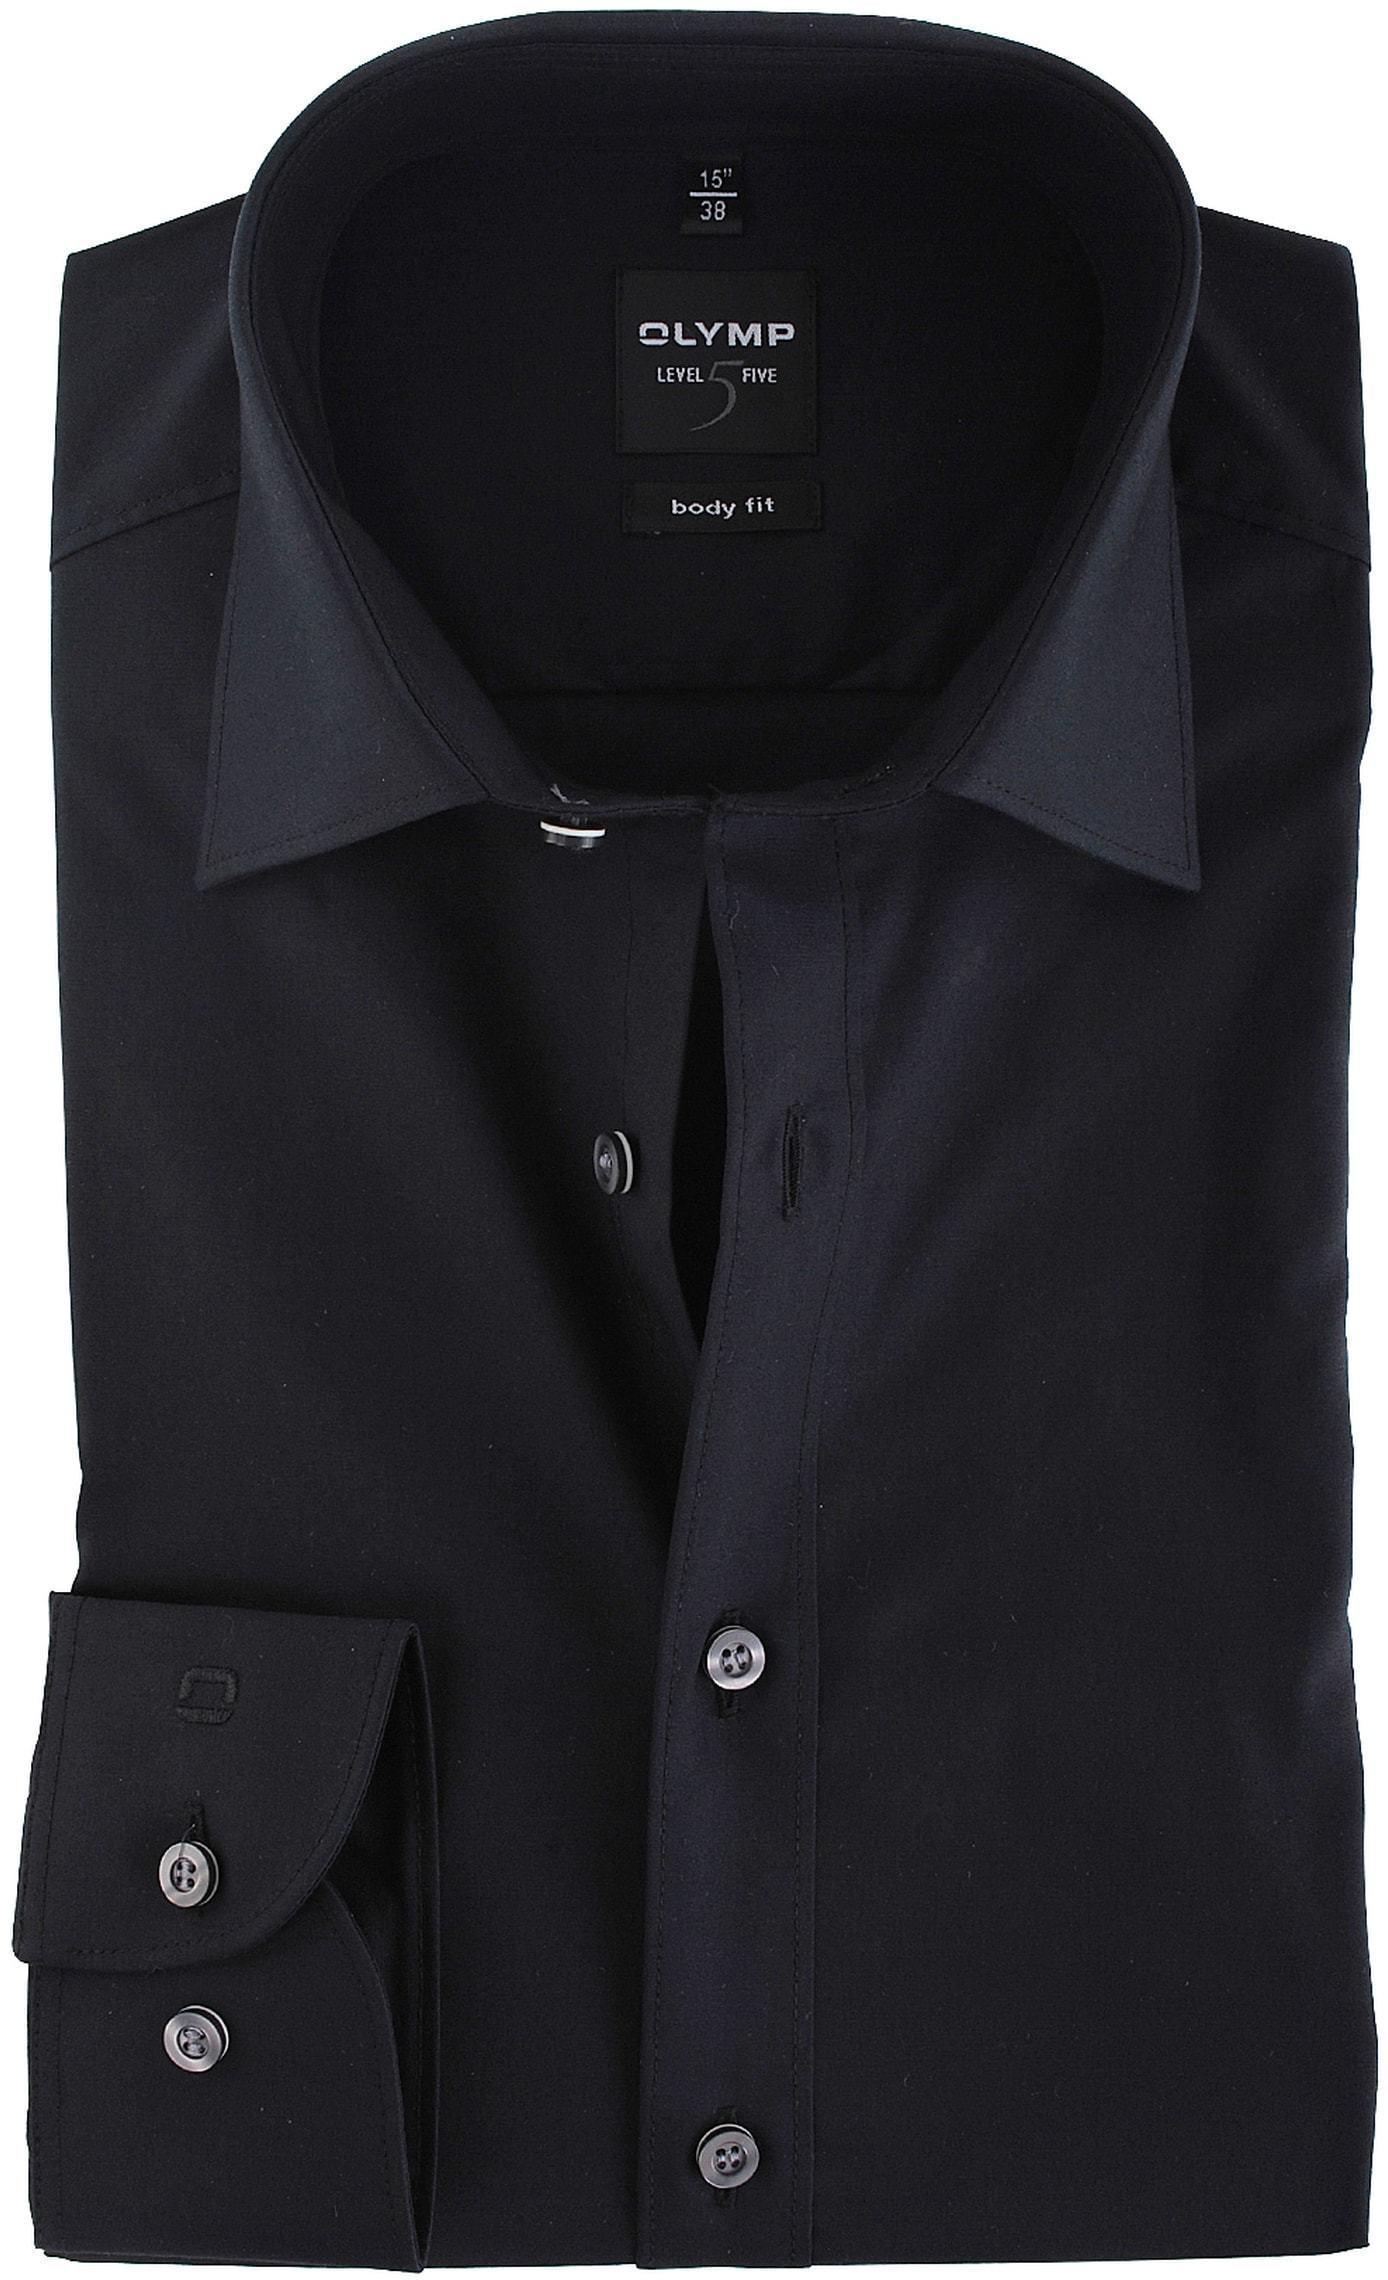 home olymp hemden olymp overhemd body fit zwart. Black Bedroom Furniture Sets. Home Design Ideas